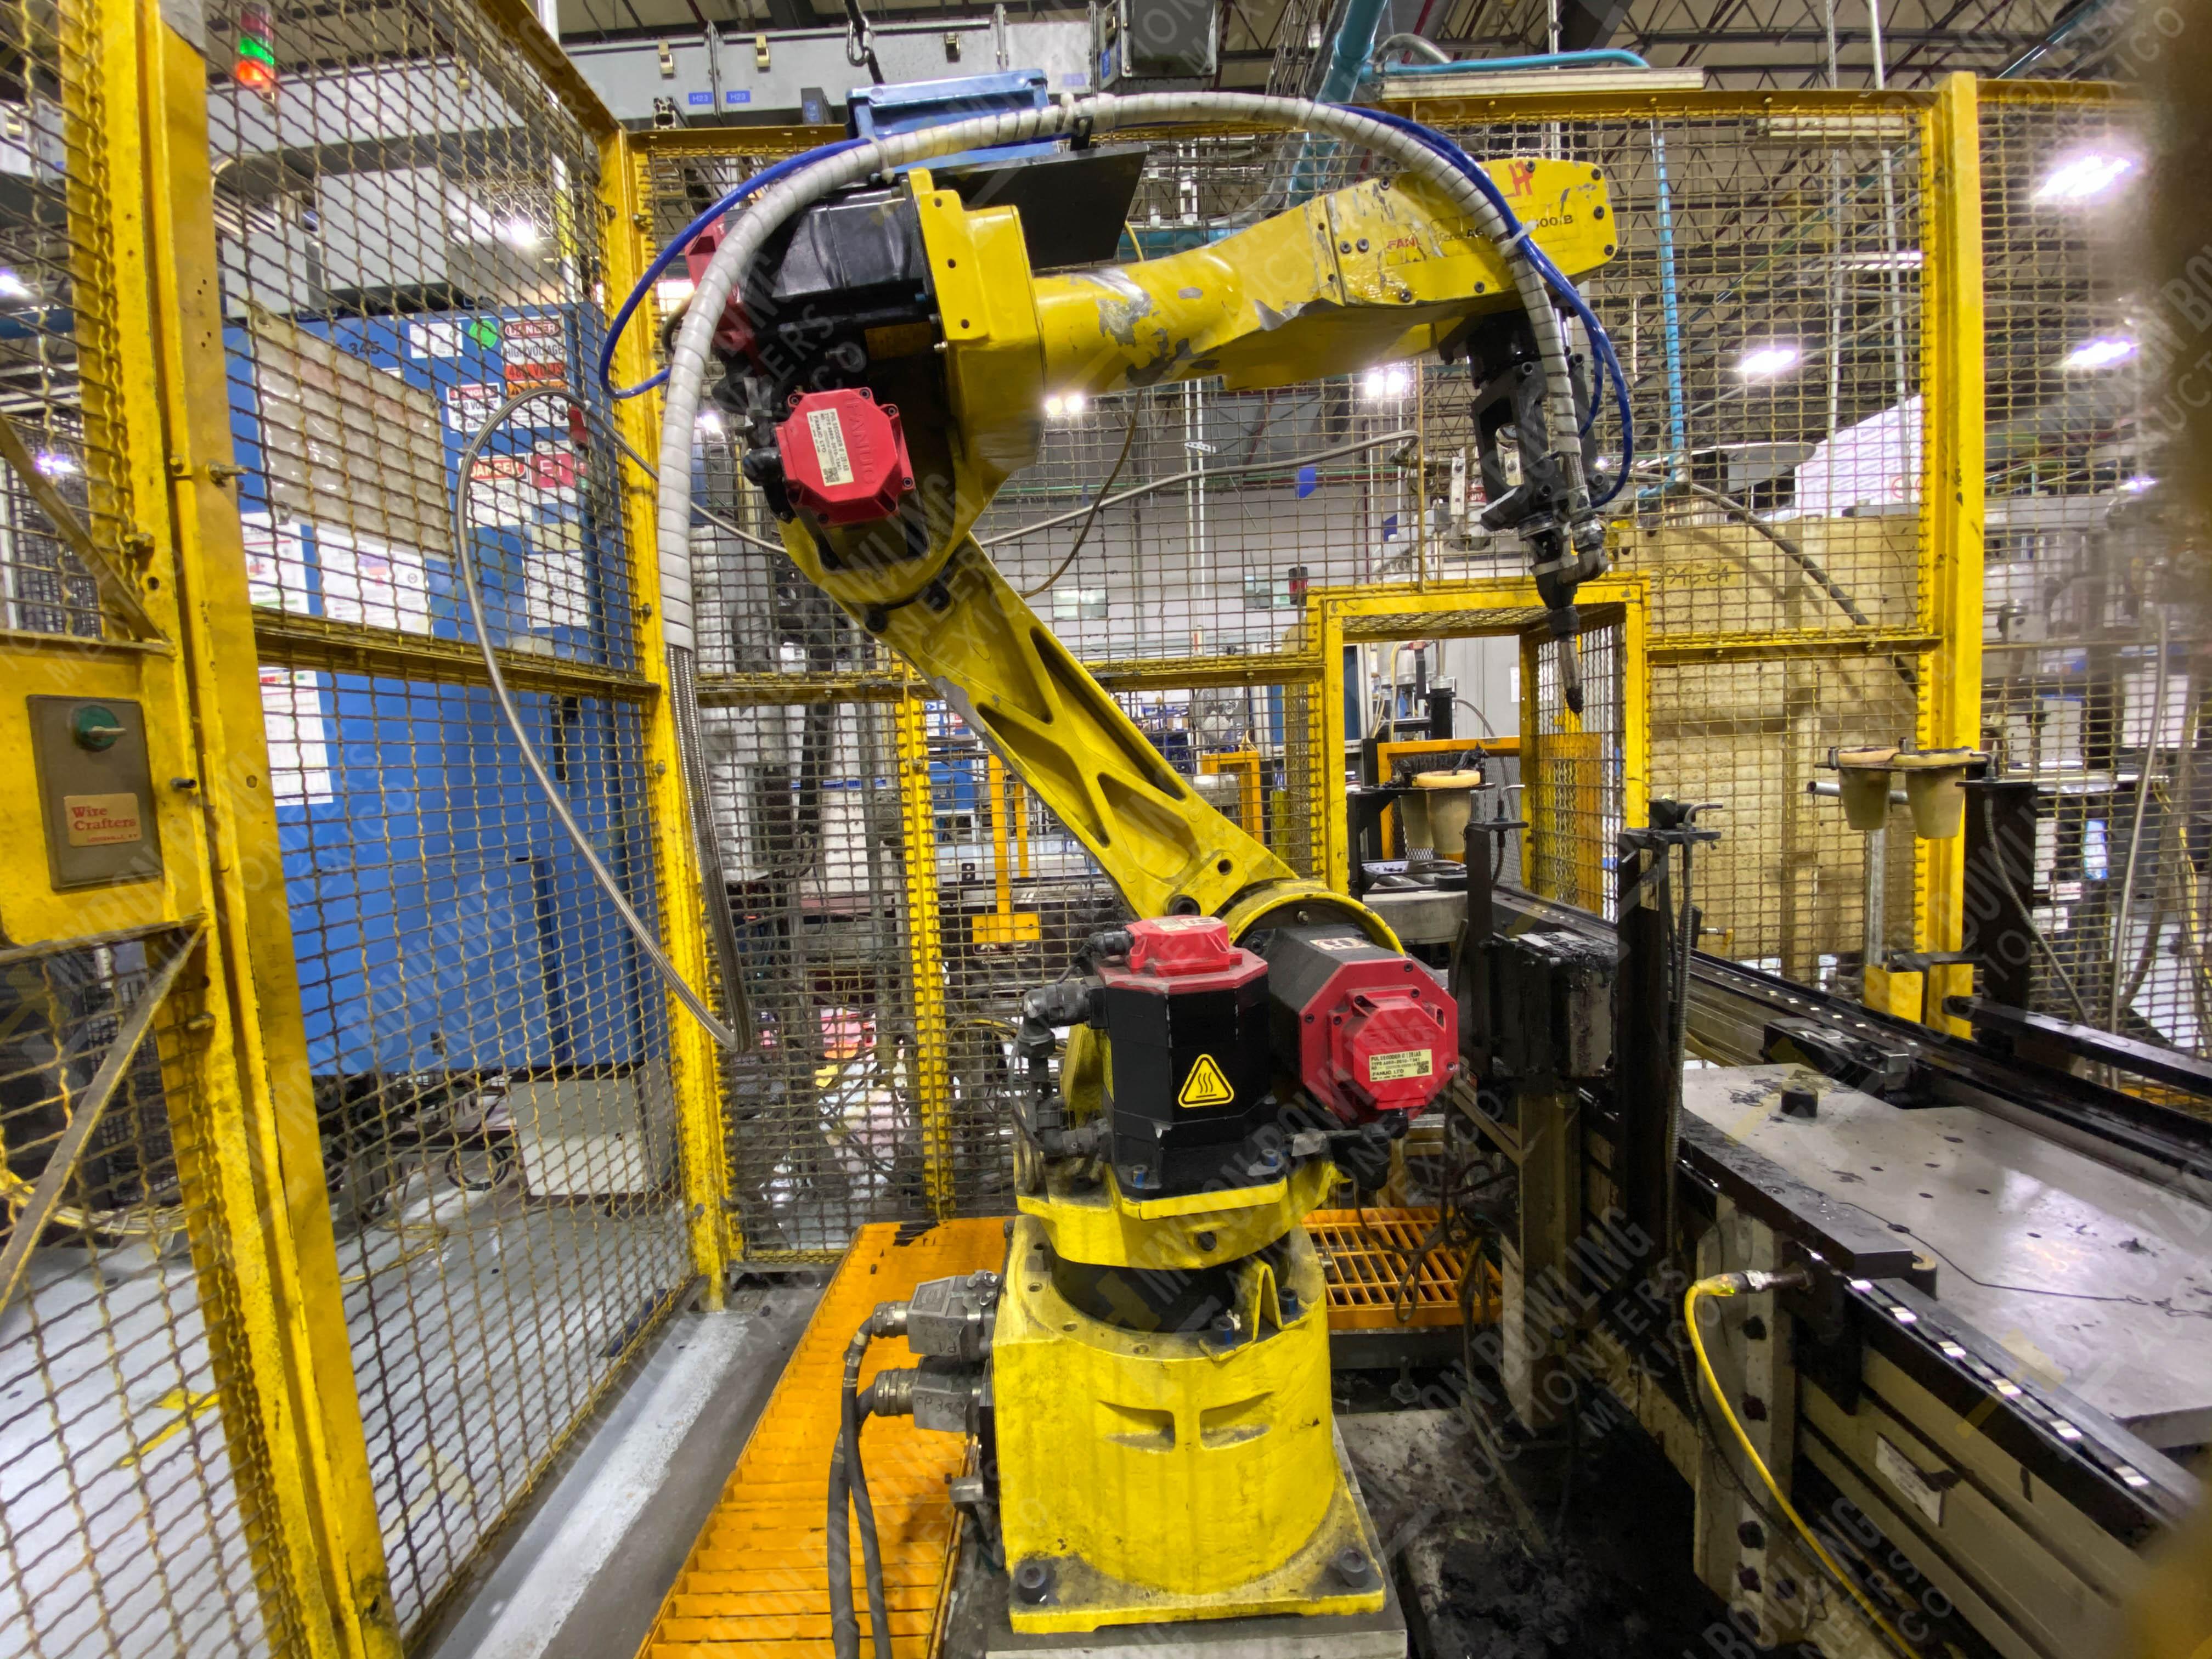 Robot marca Fanuc con capacidad de carga de 15-30 Kg, controlador de robot y teach pendant